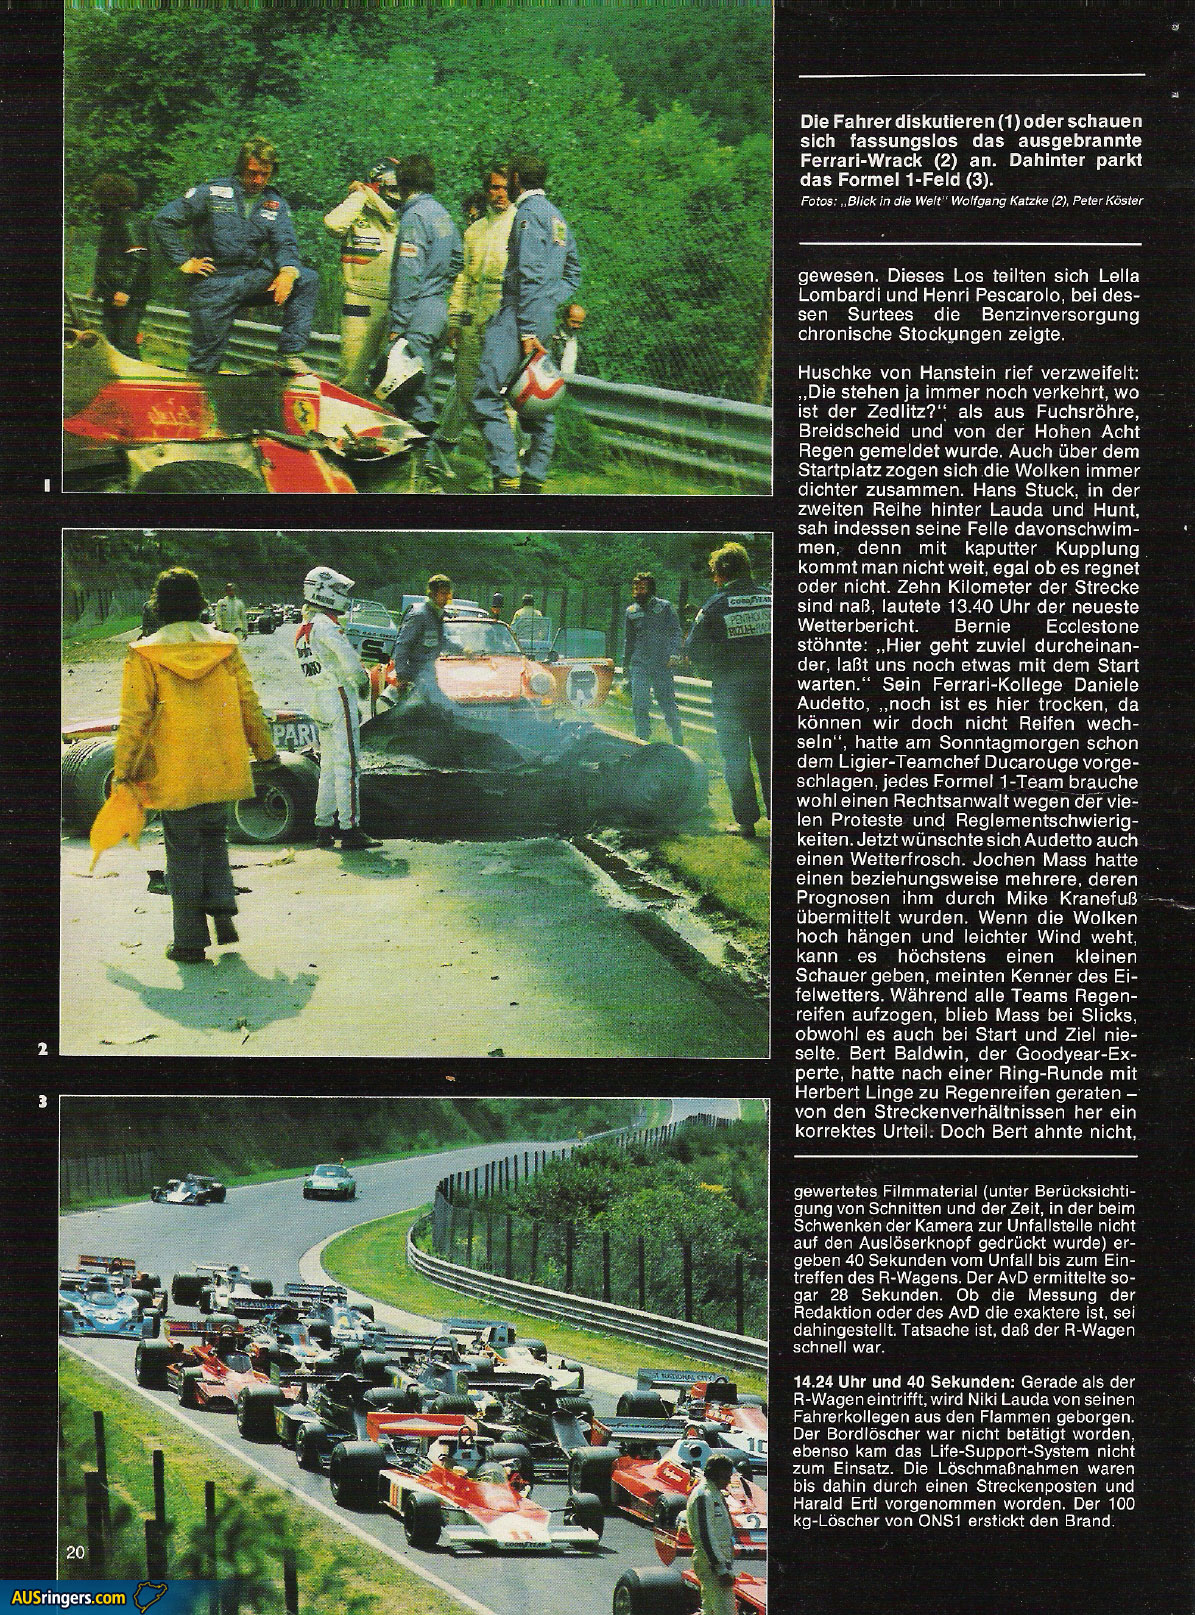 Niki Lauda Unfall 1976